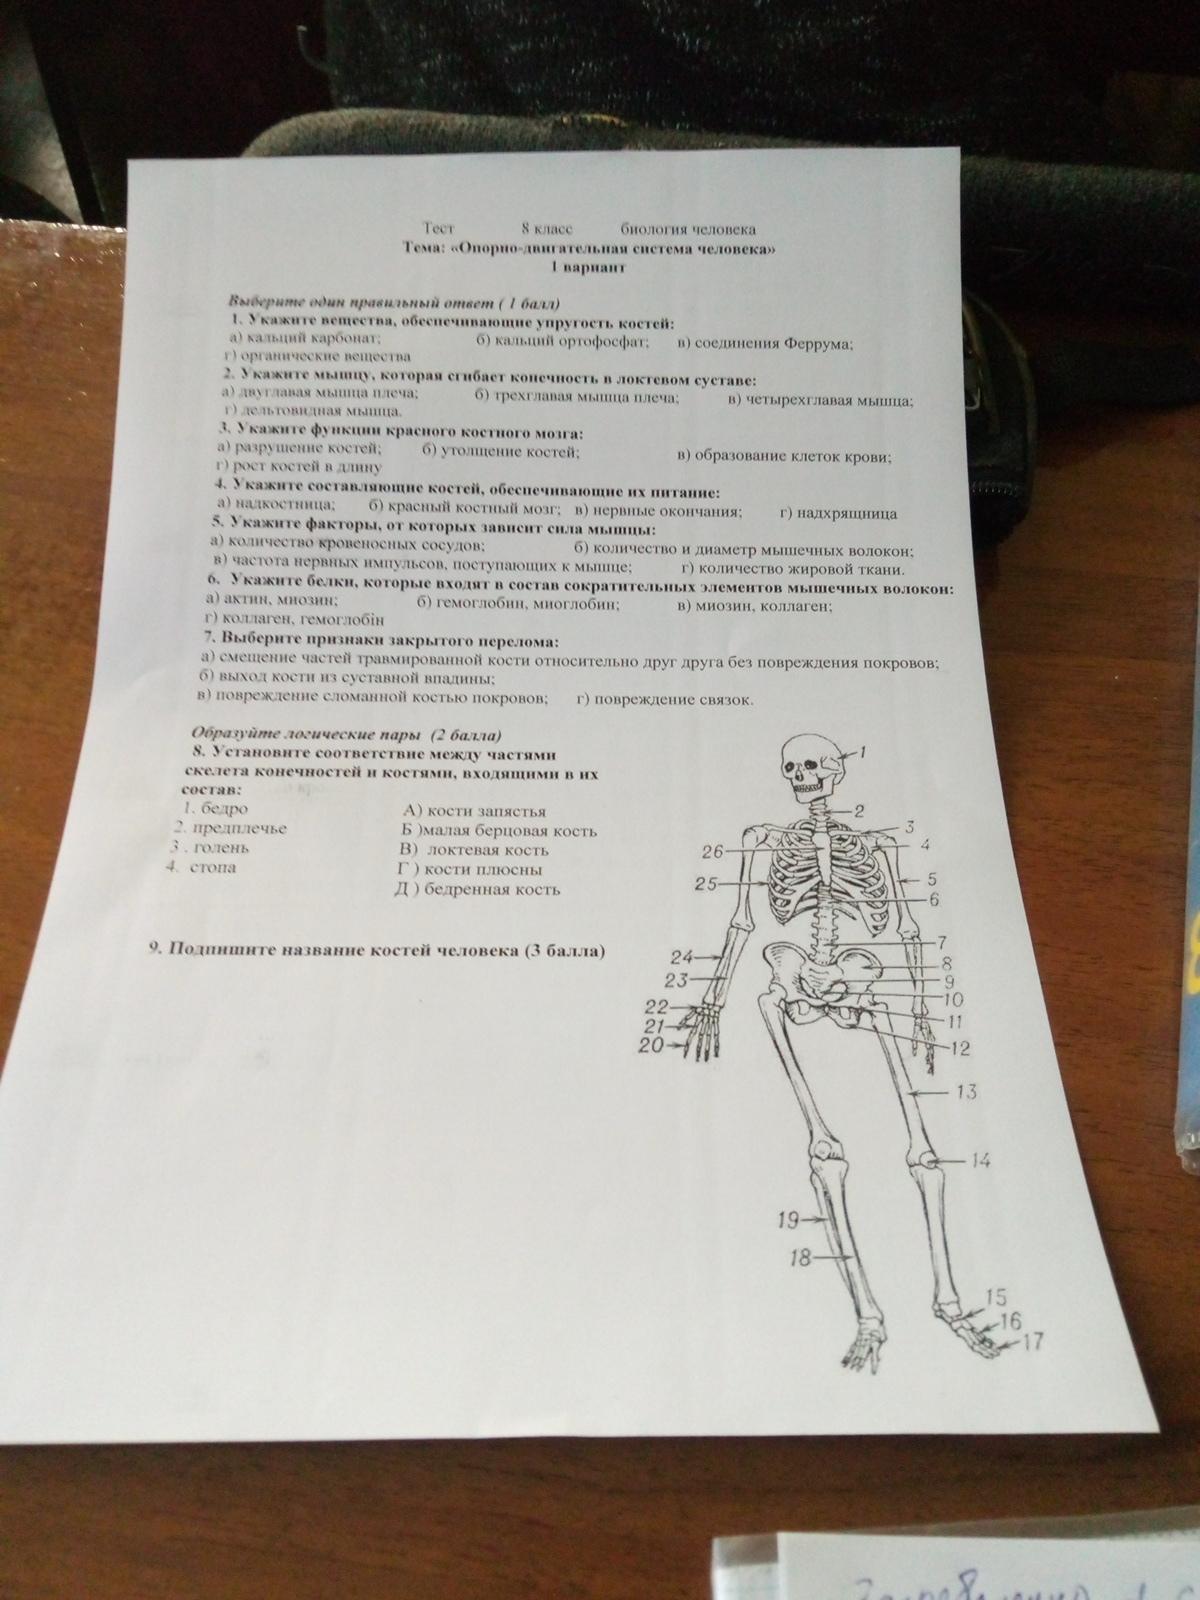 Подпишите название костей и задание?